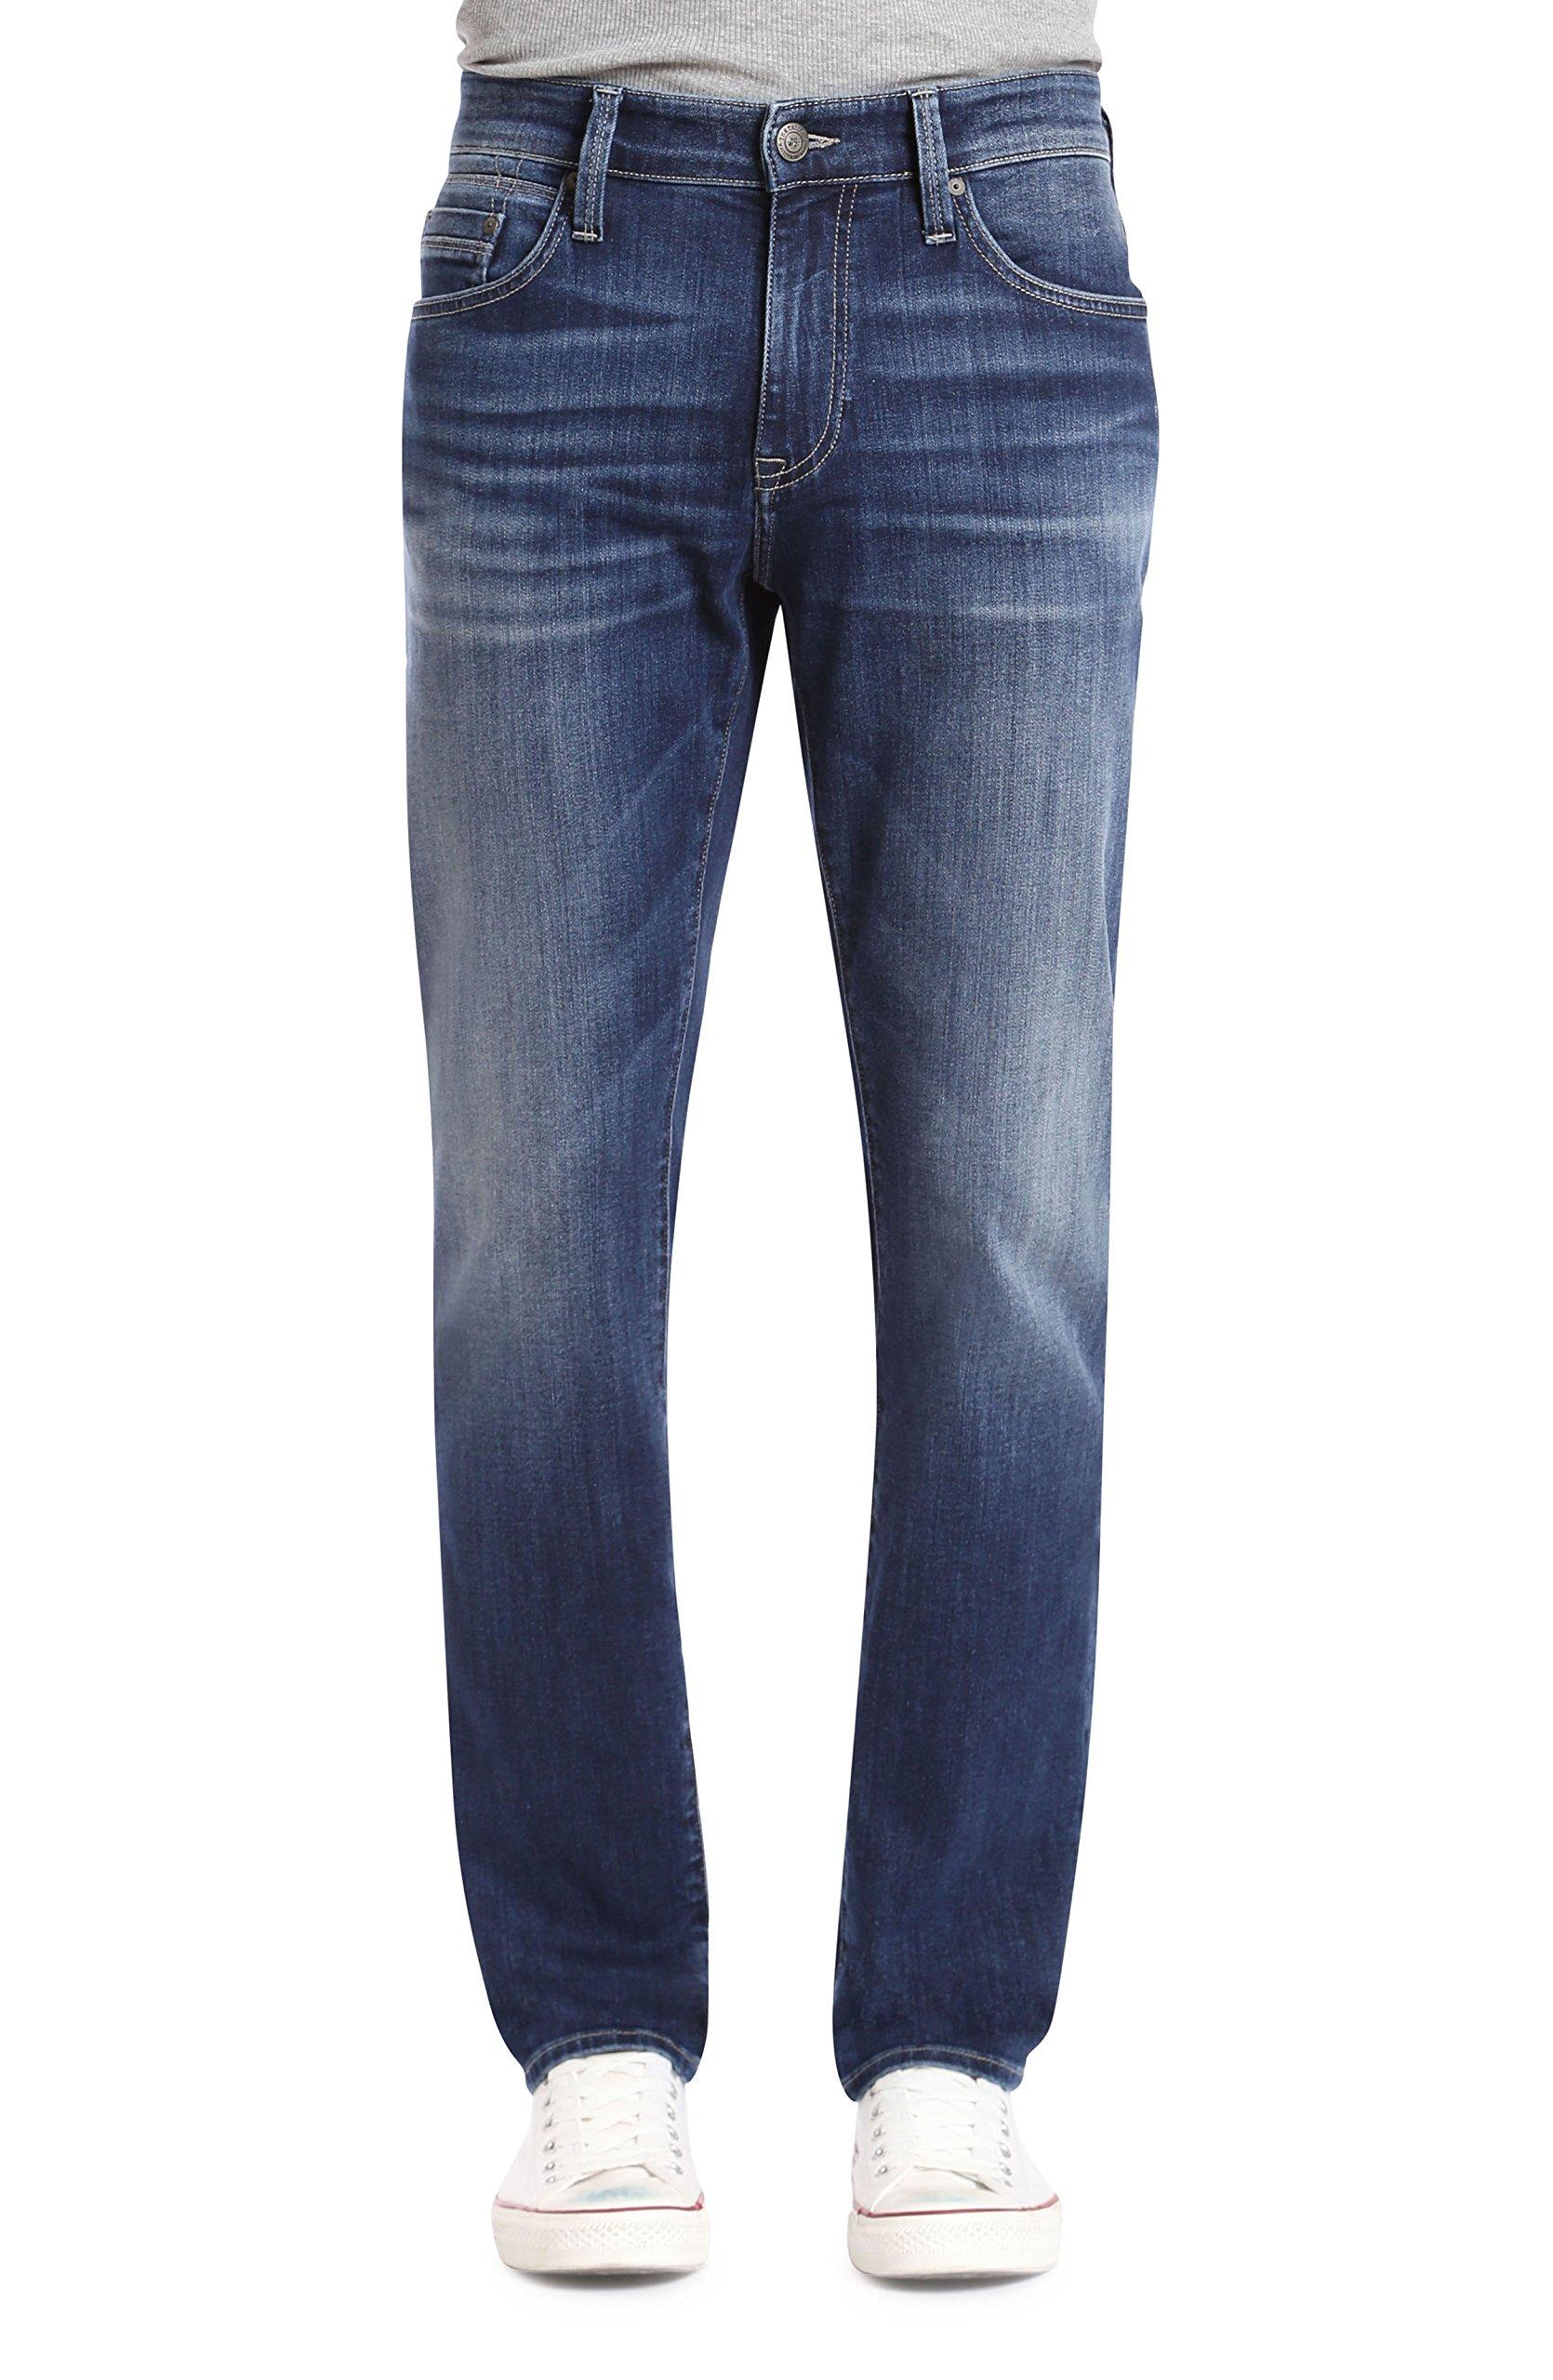 Mavi Jeans Men's Marcus Regular Rise Slim Straight Leg in Dark Blue Williamsburg Dark Blue Williamsburg 33 32